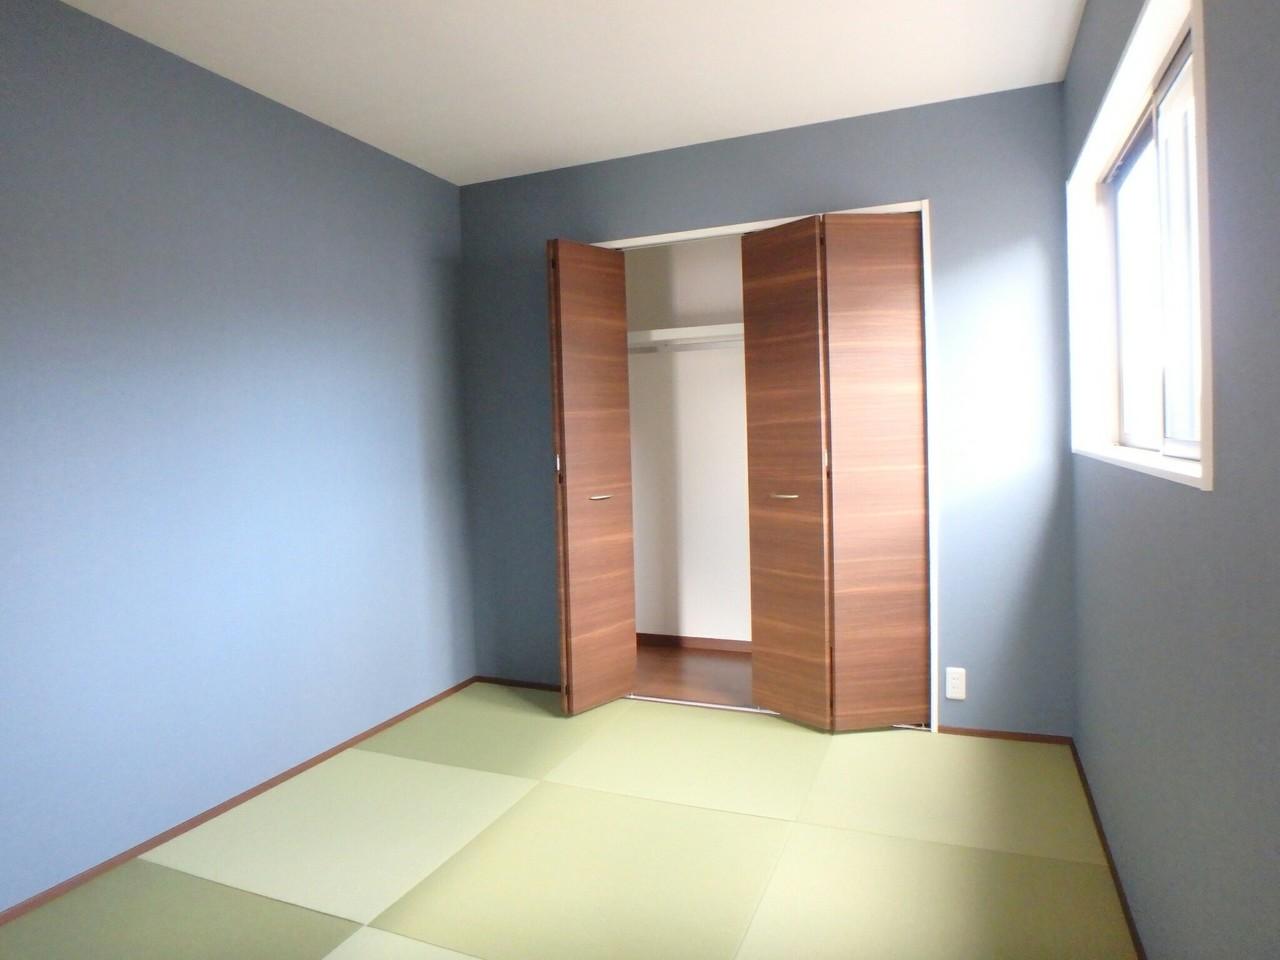 LDKとつながった多目的に使える和室スペース。 収納は広めの設計になっているので、お部屋を広々と使えそうですね♪